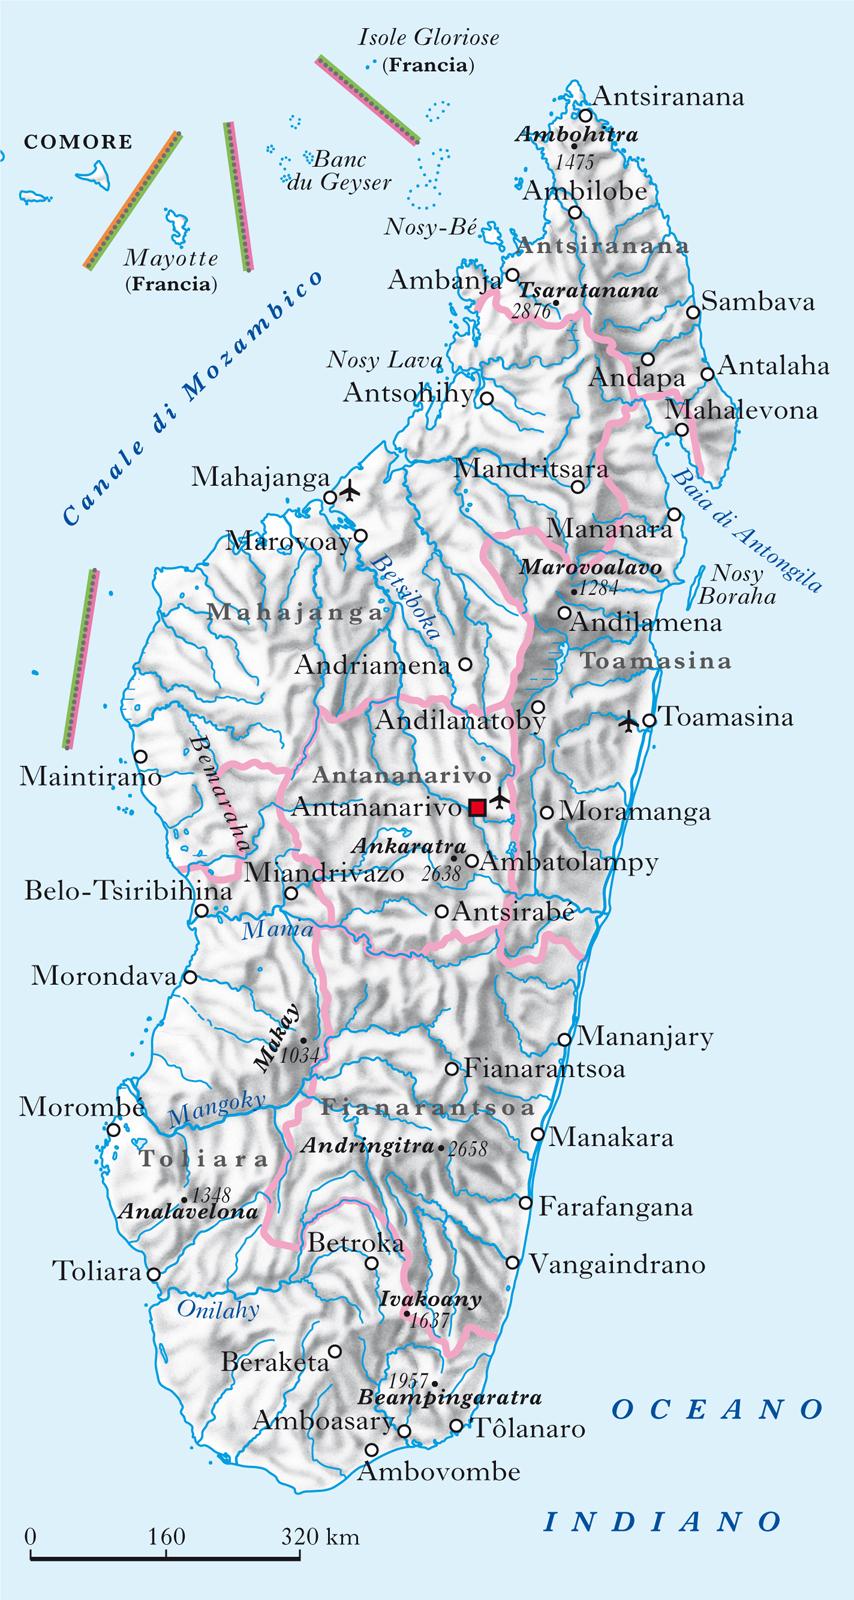 Geopolitico Madagascar Madagascar Atlante In In lwZOukXPiT